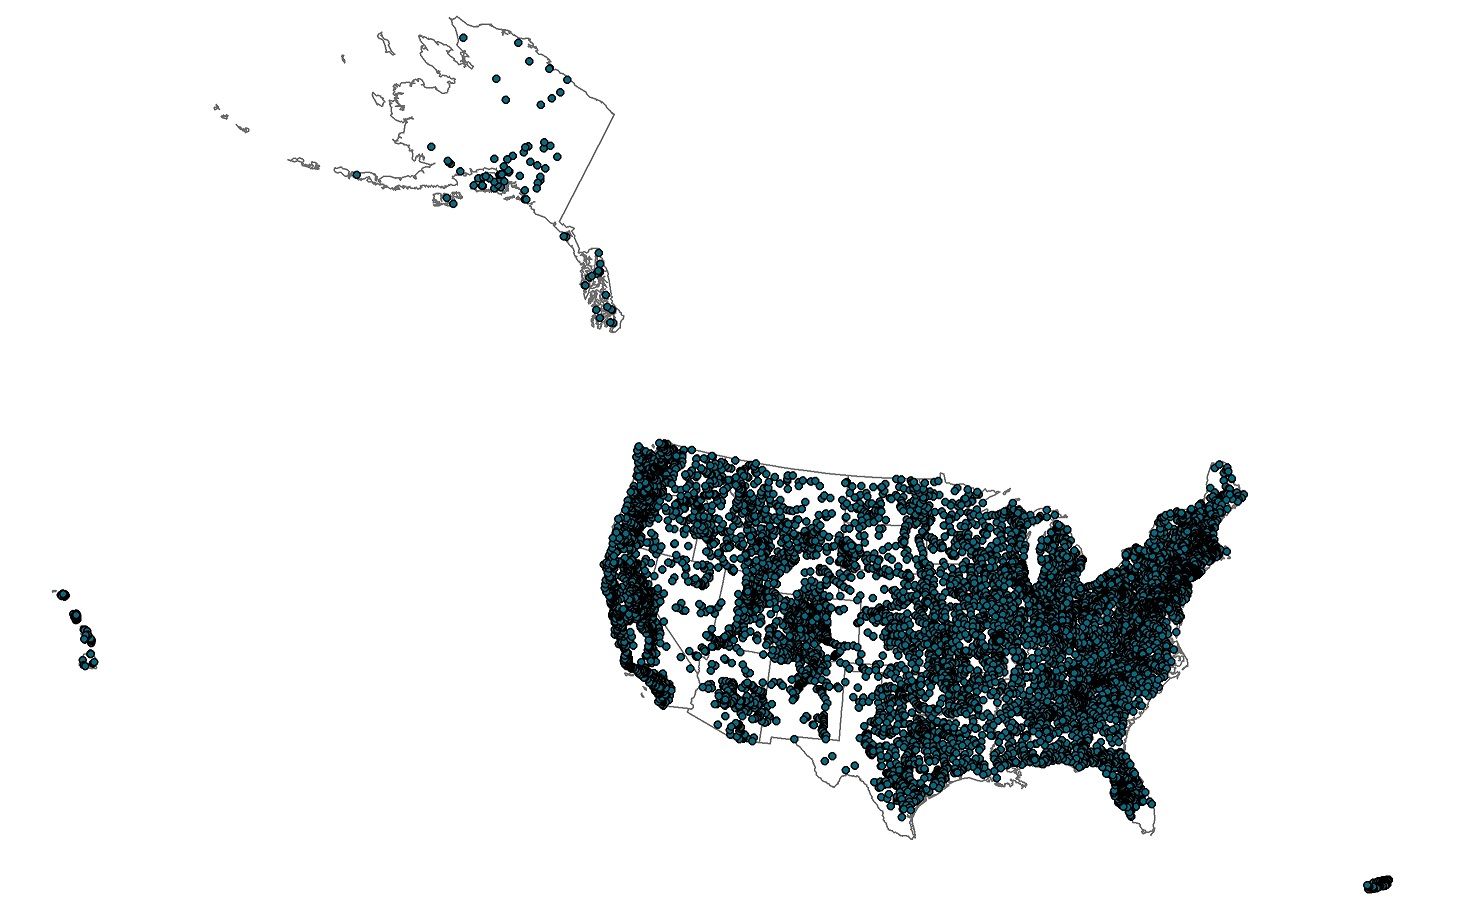 Illustration of the dataset